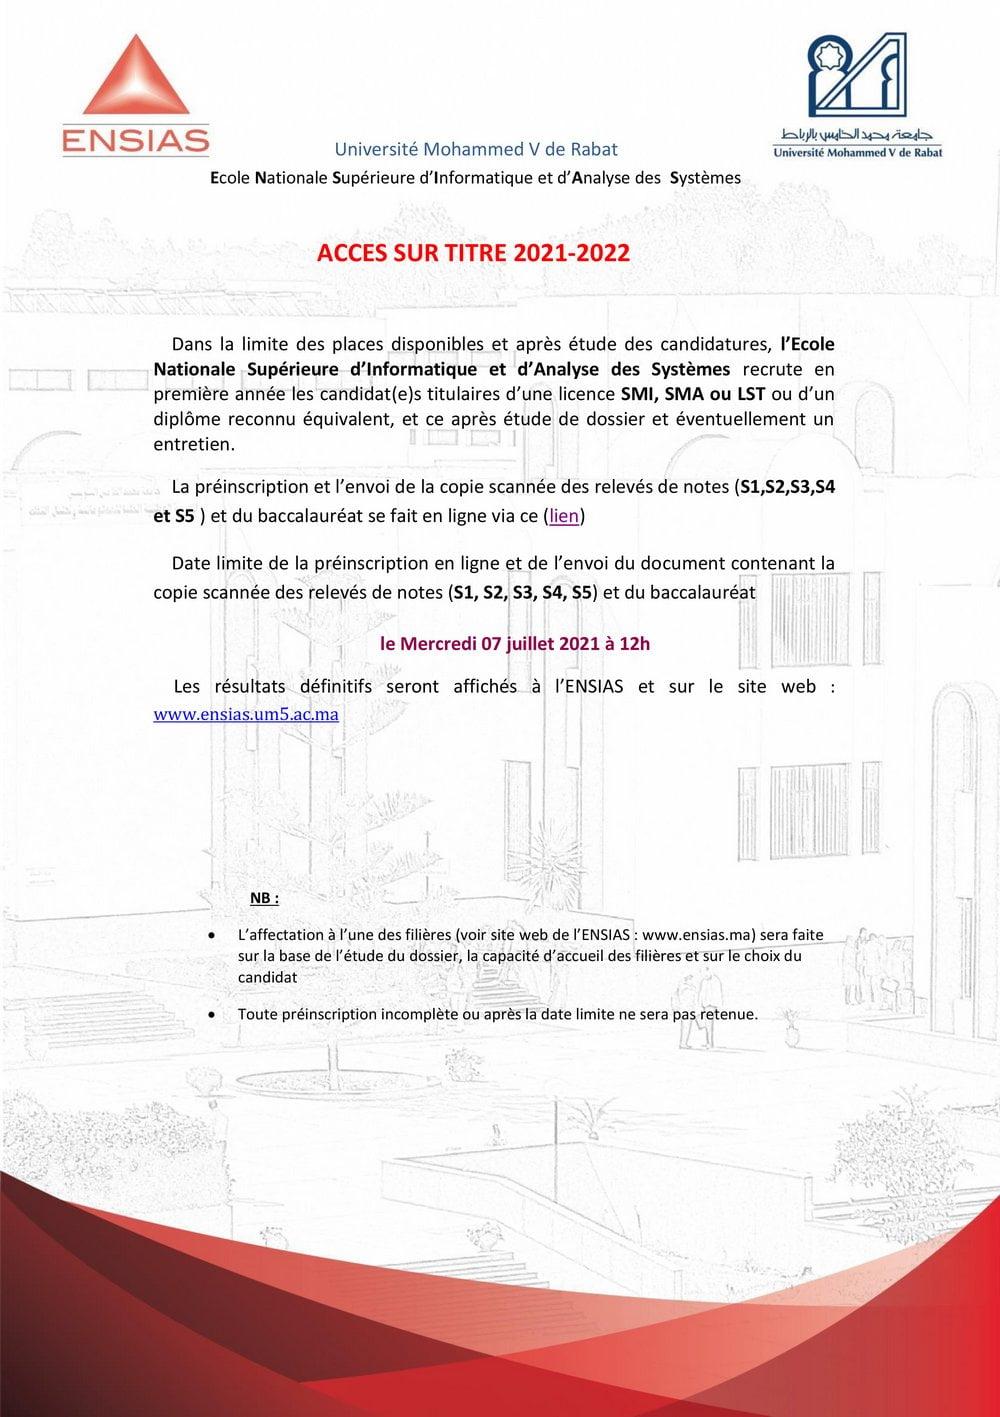 concours ensias 2022/2021